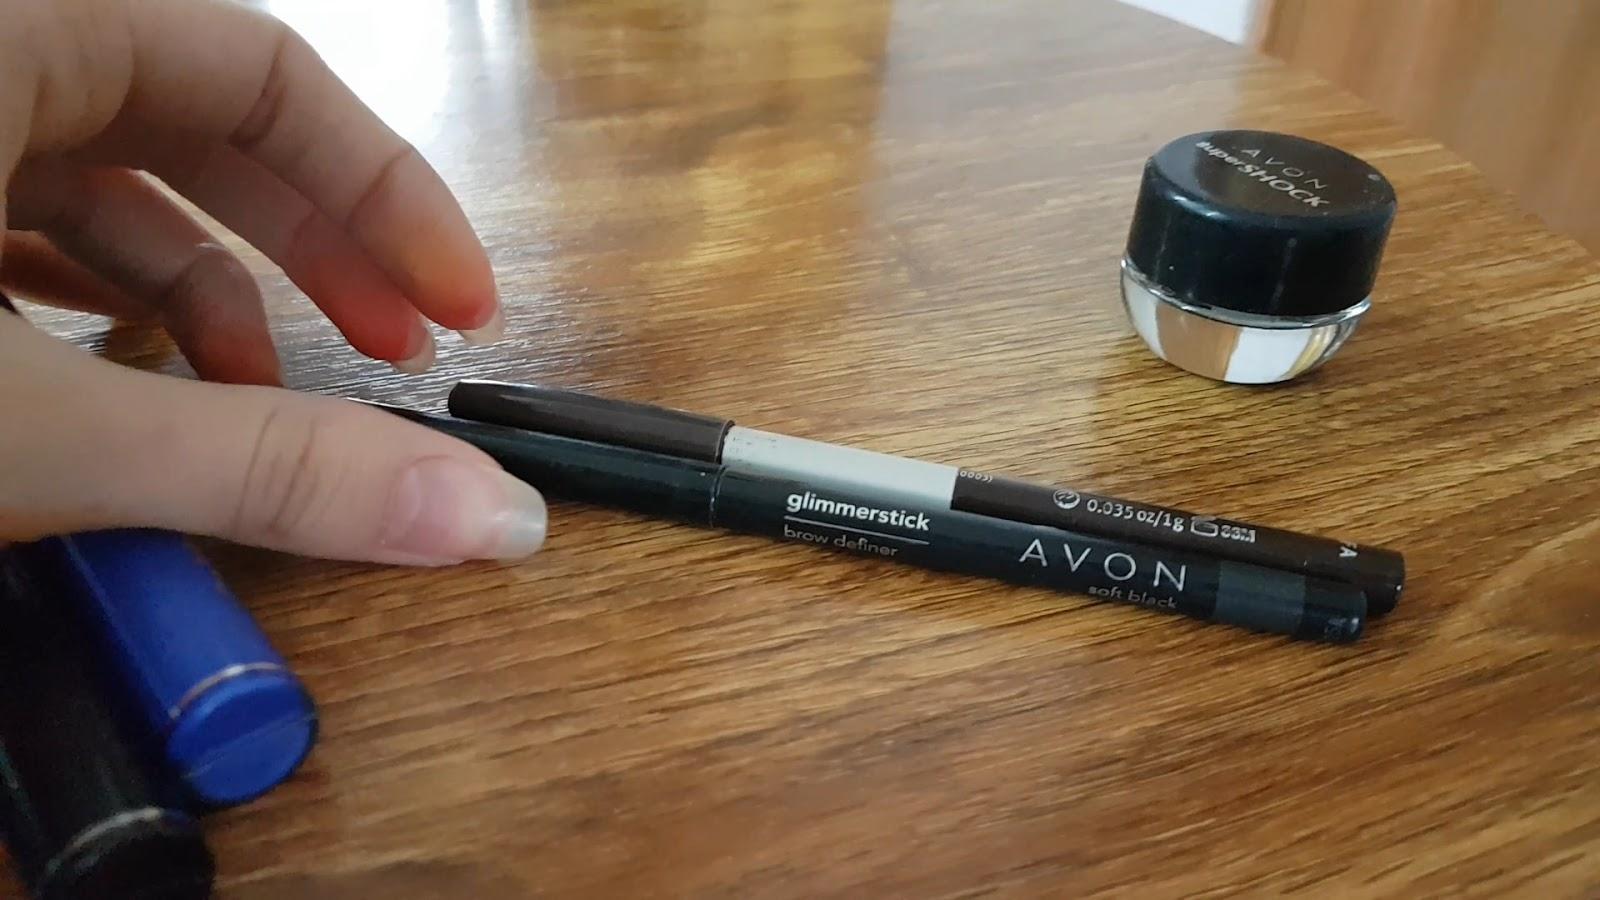 Olovke za obrve, Avon i Essence